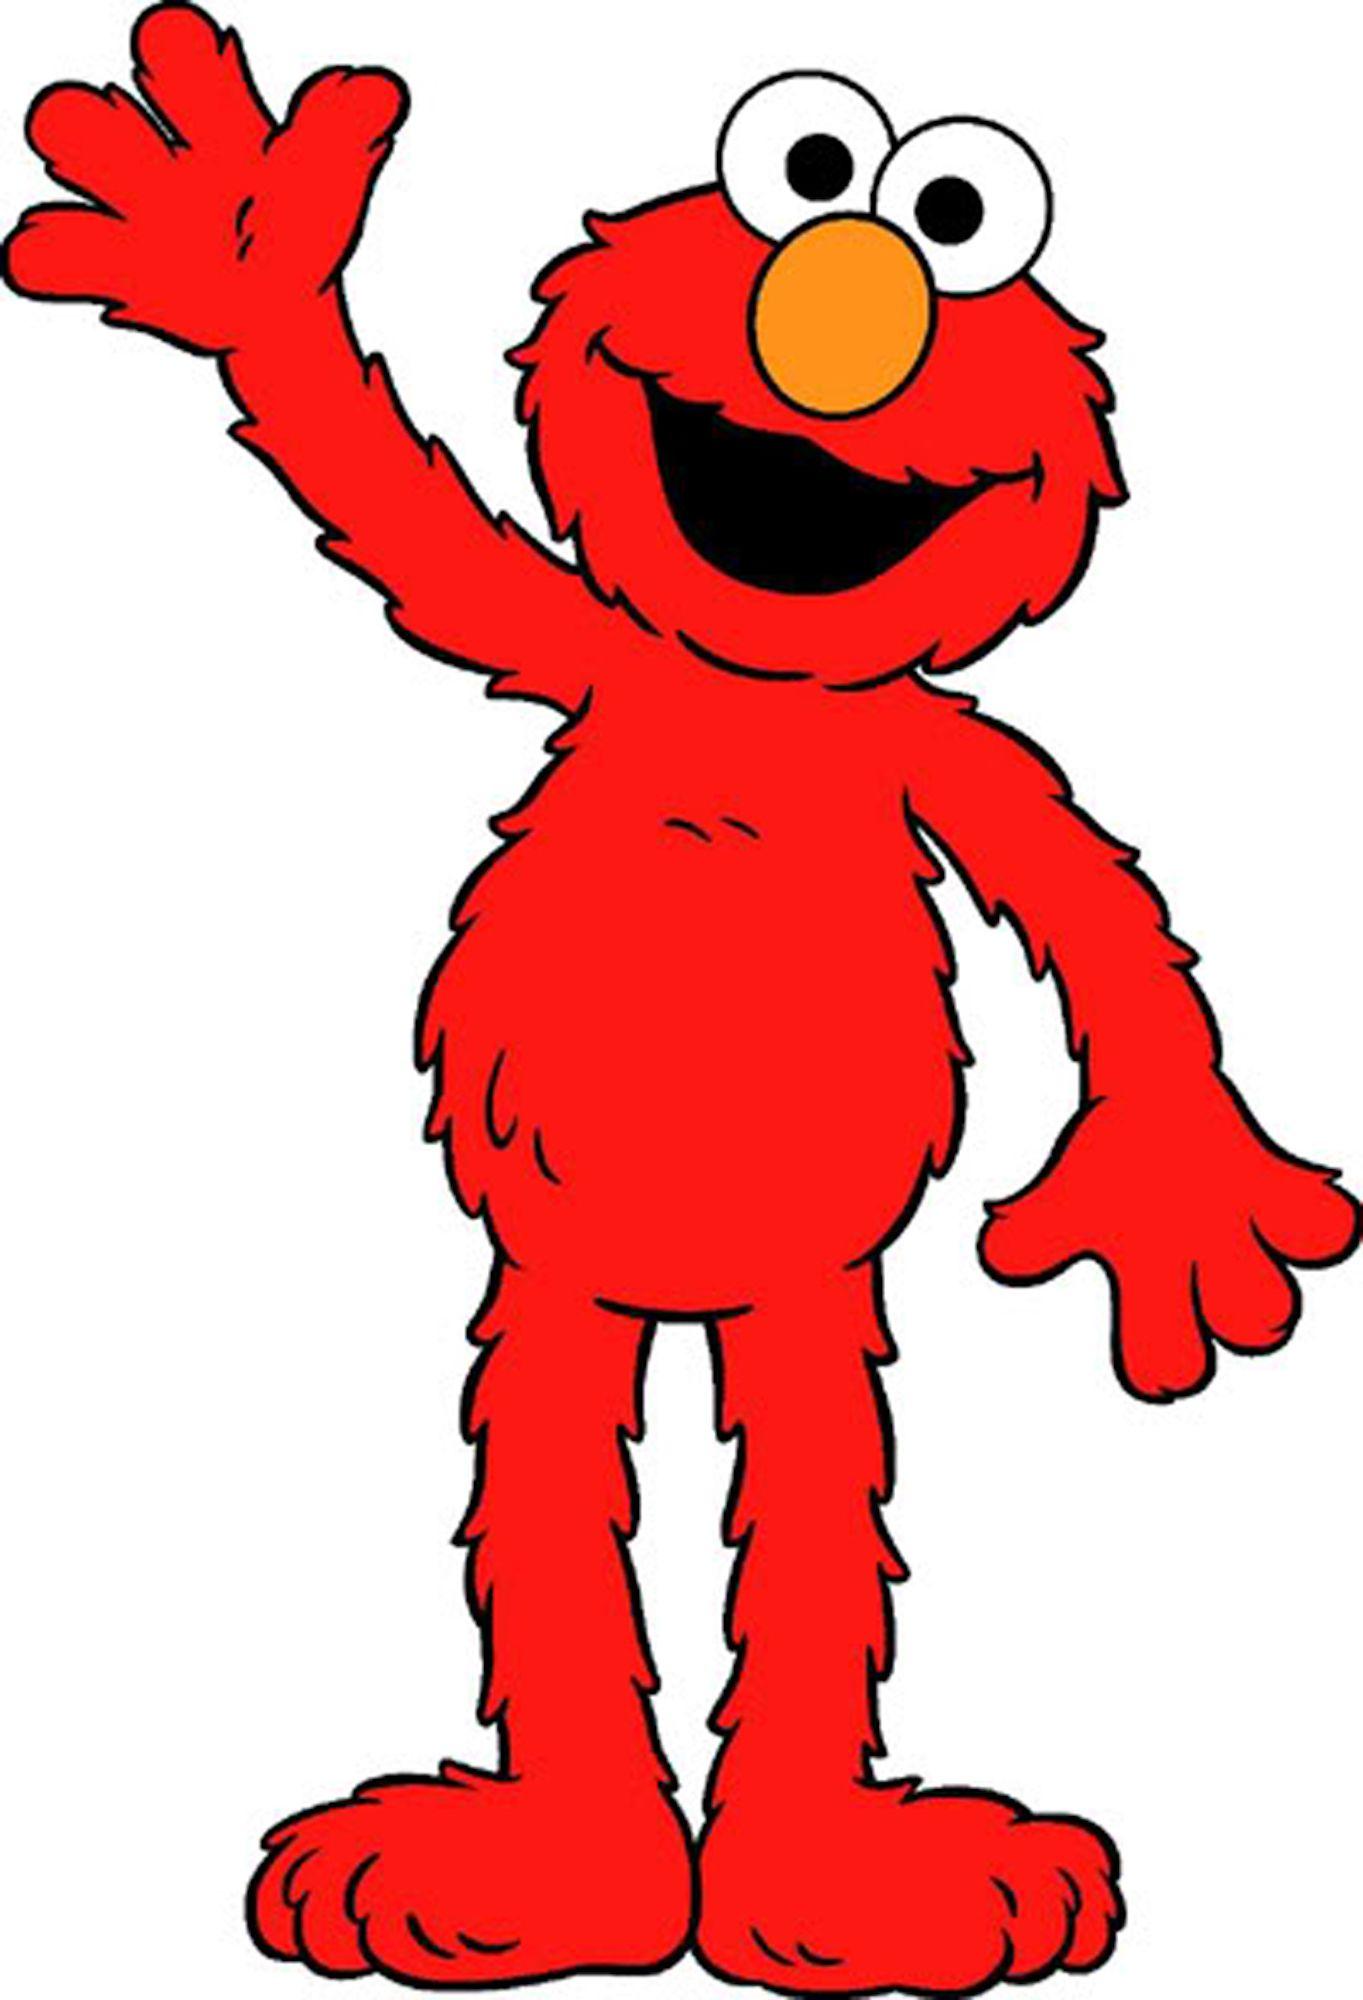 image about Elmo Printable identified as Printable Elmo Otis 2nd Birthday - Celebration Suggestions inside of 2019